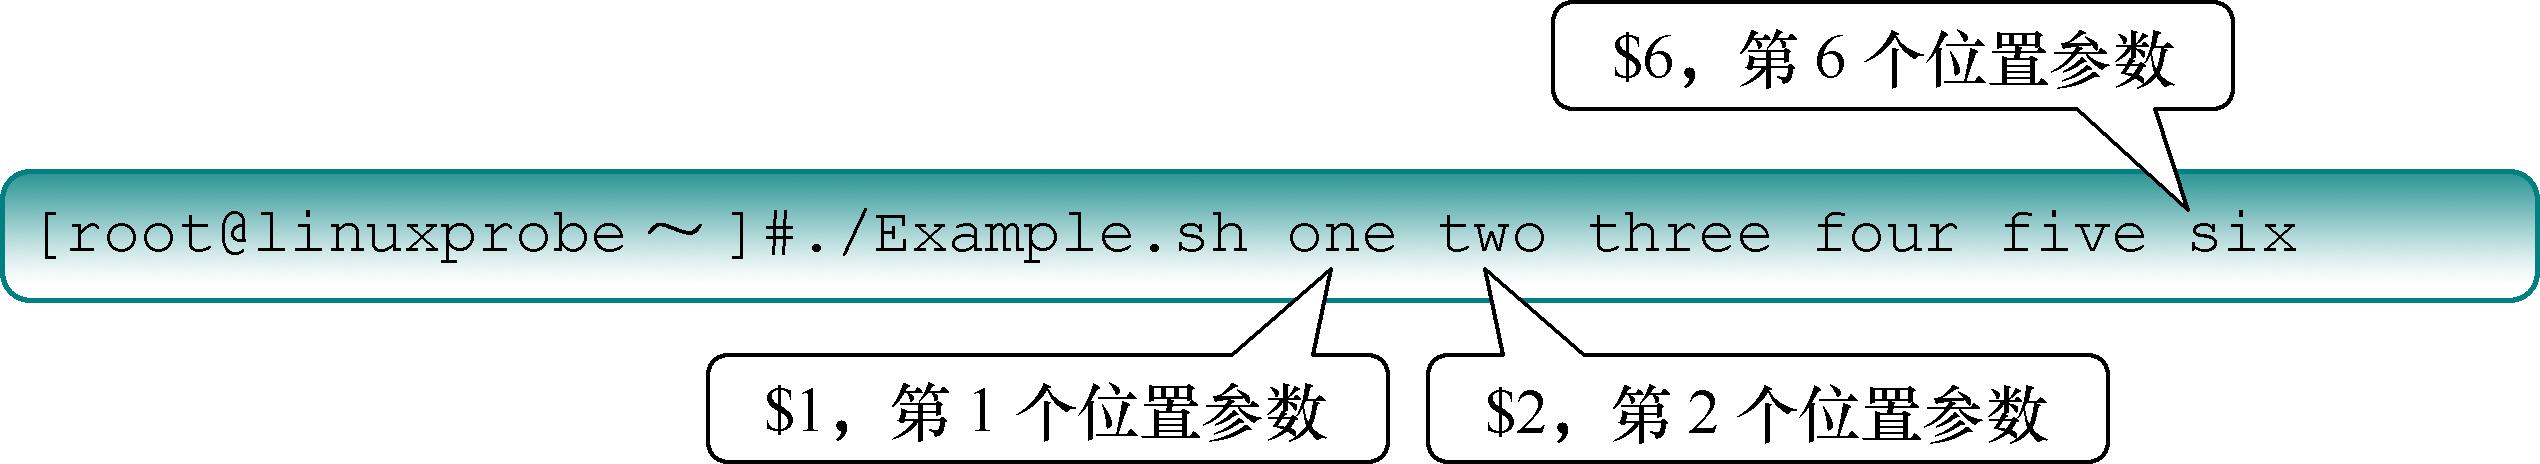 第4章 Vim编辑器与Shell命令脚本。